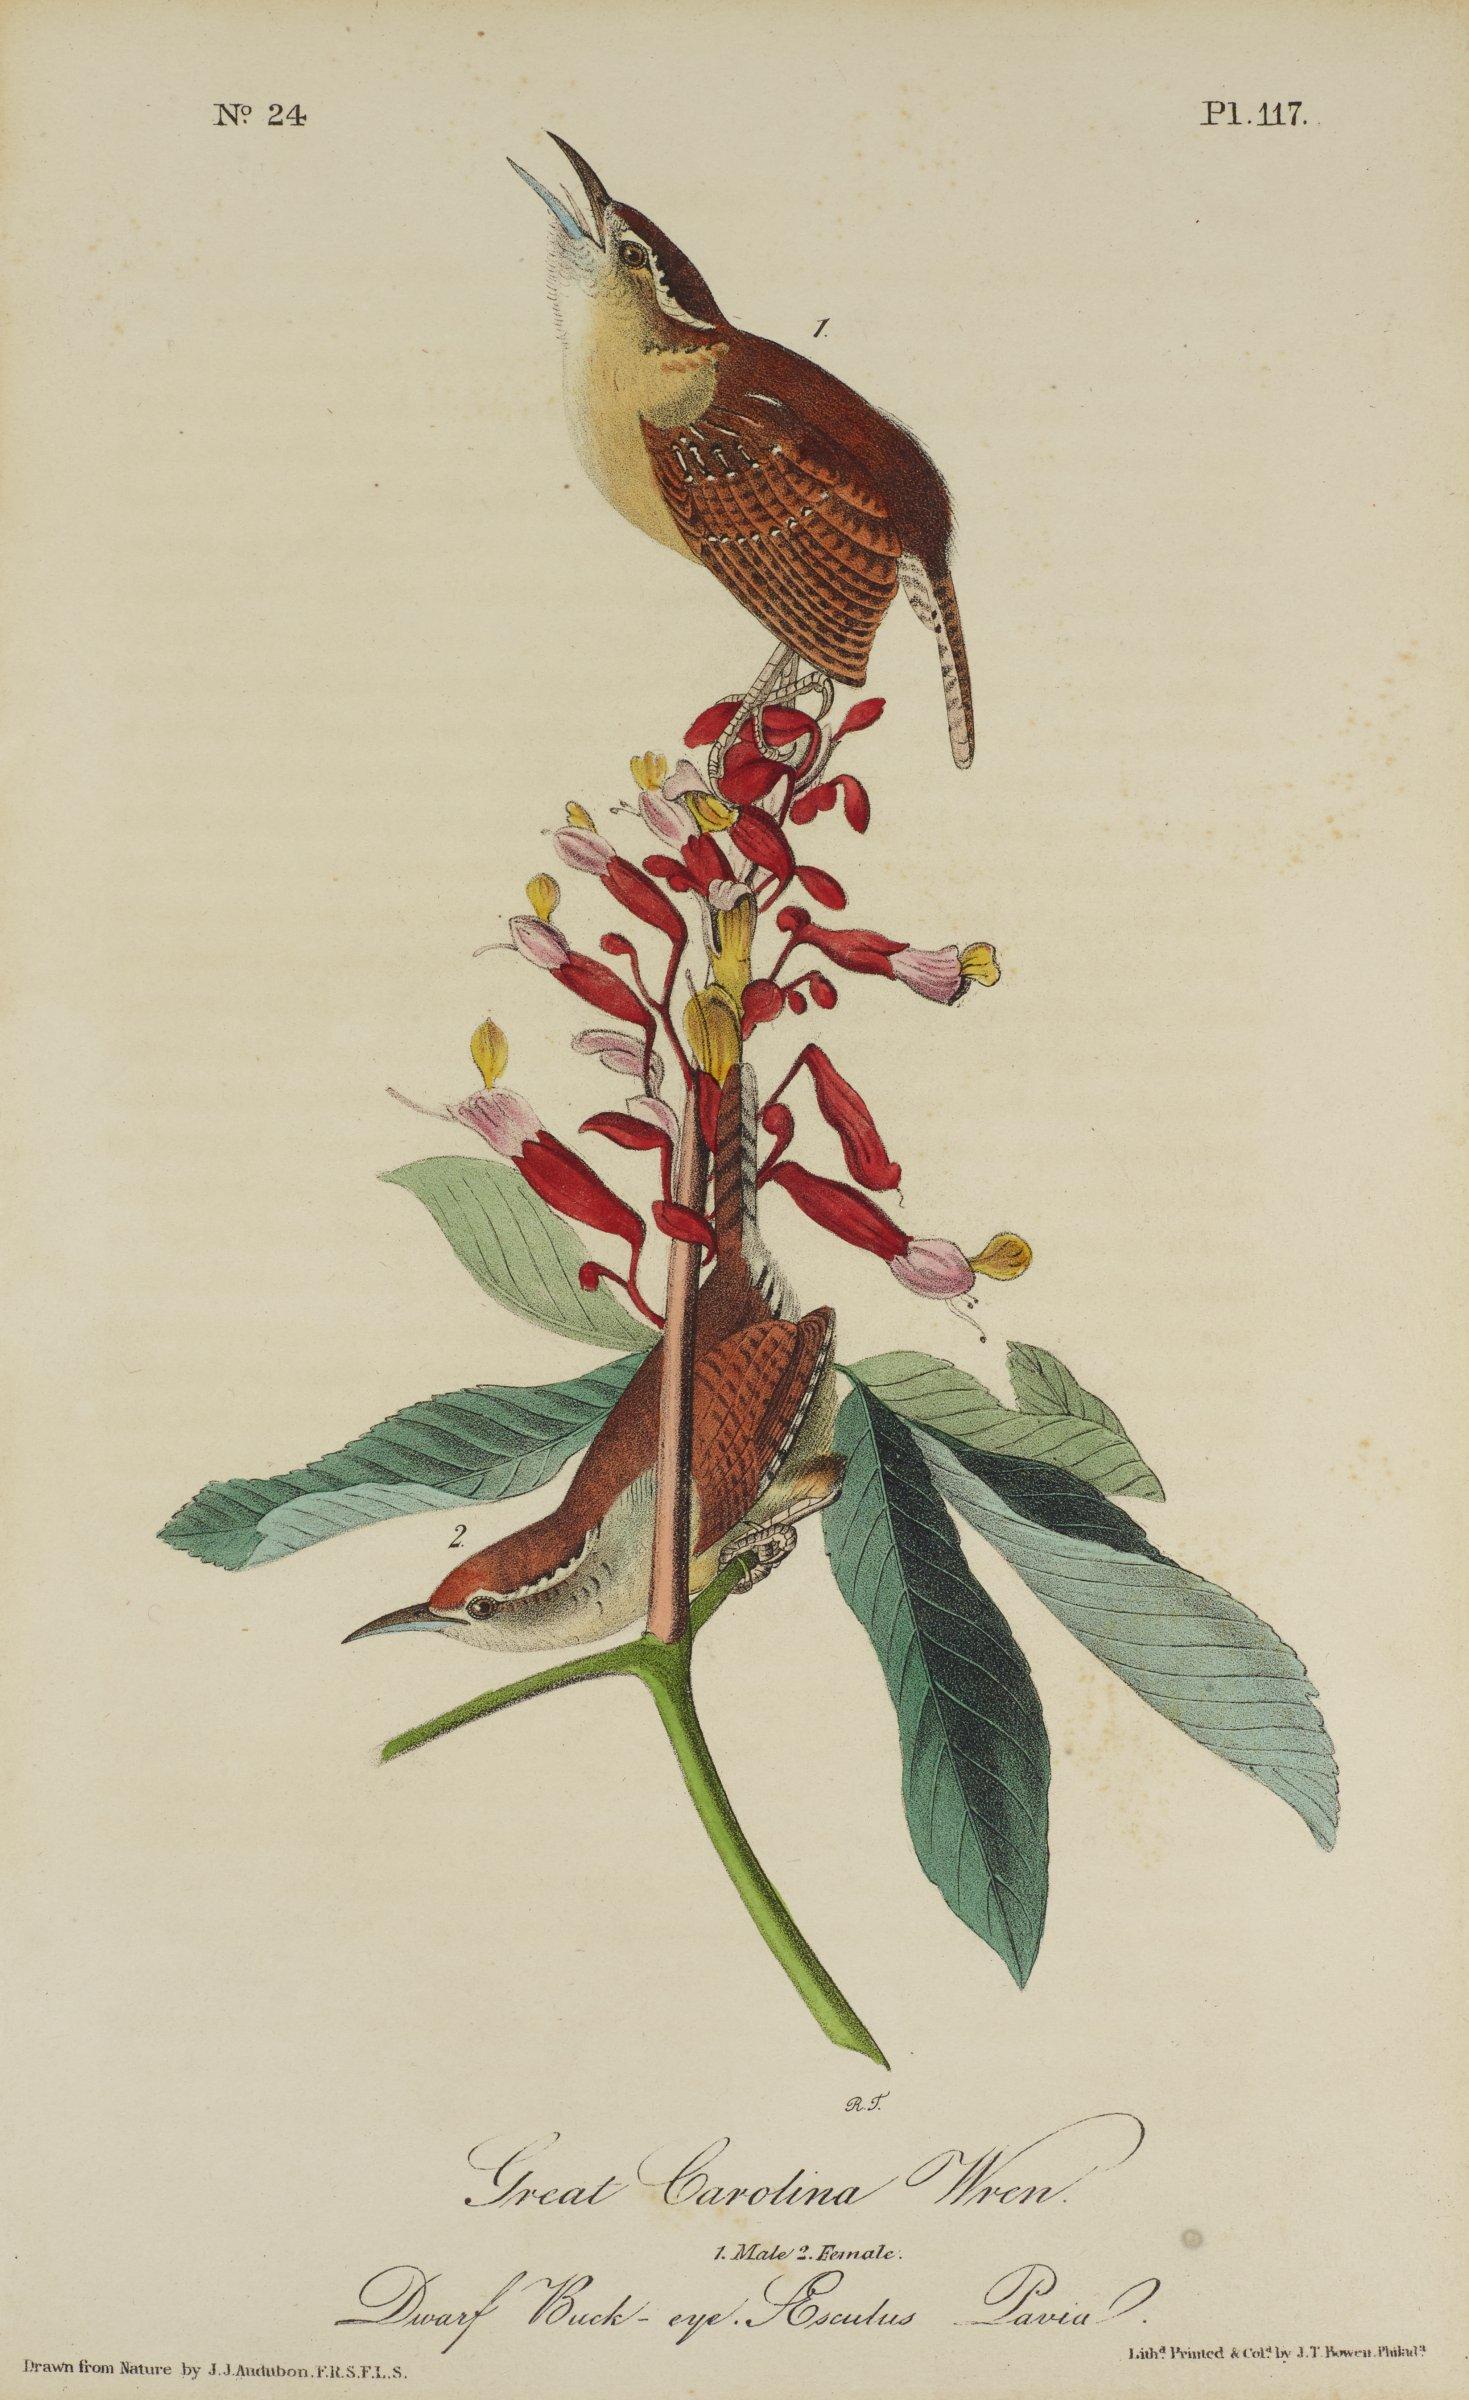 Great Carolina Wren, John James Audubon, Printed by John T. Bowen, Philadelphia, Pennsylvania, lithography with watercolor (hand coloring)